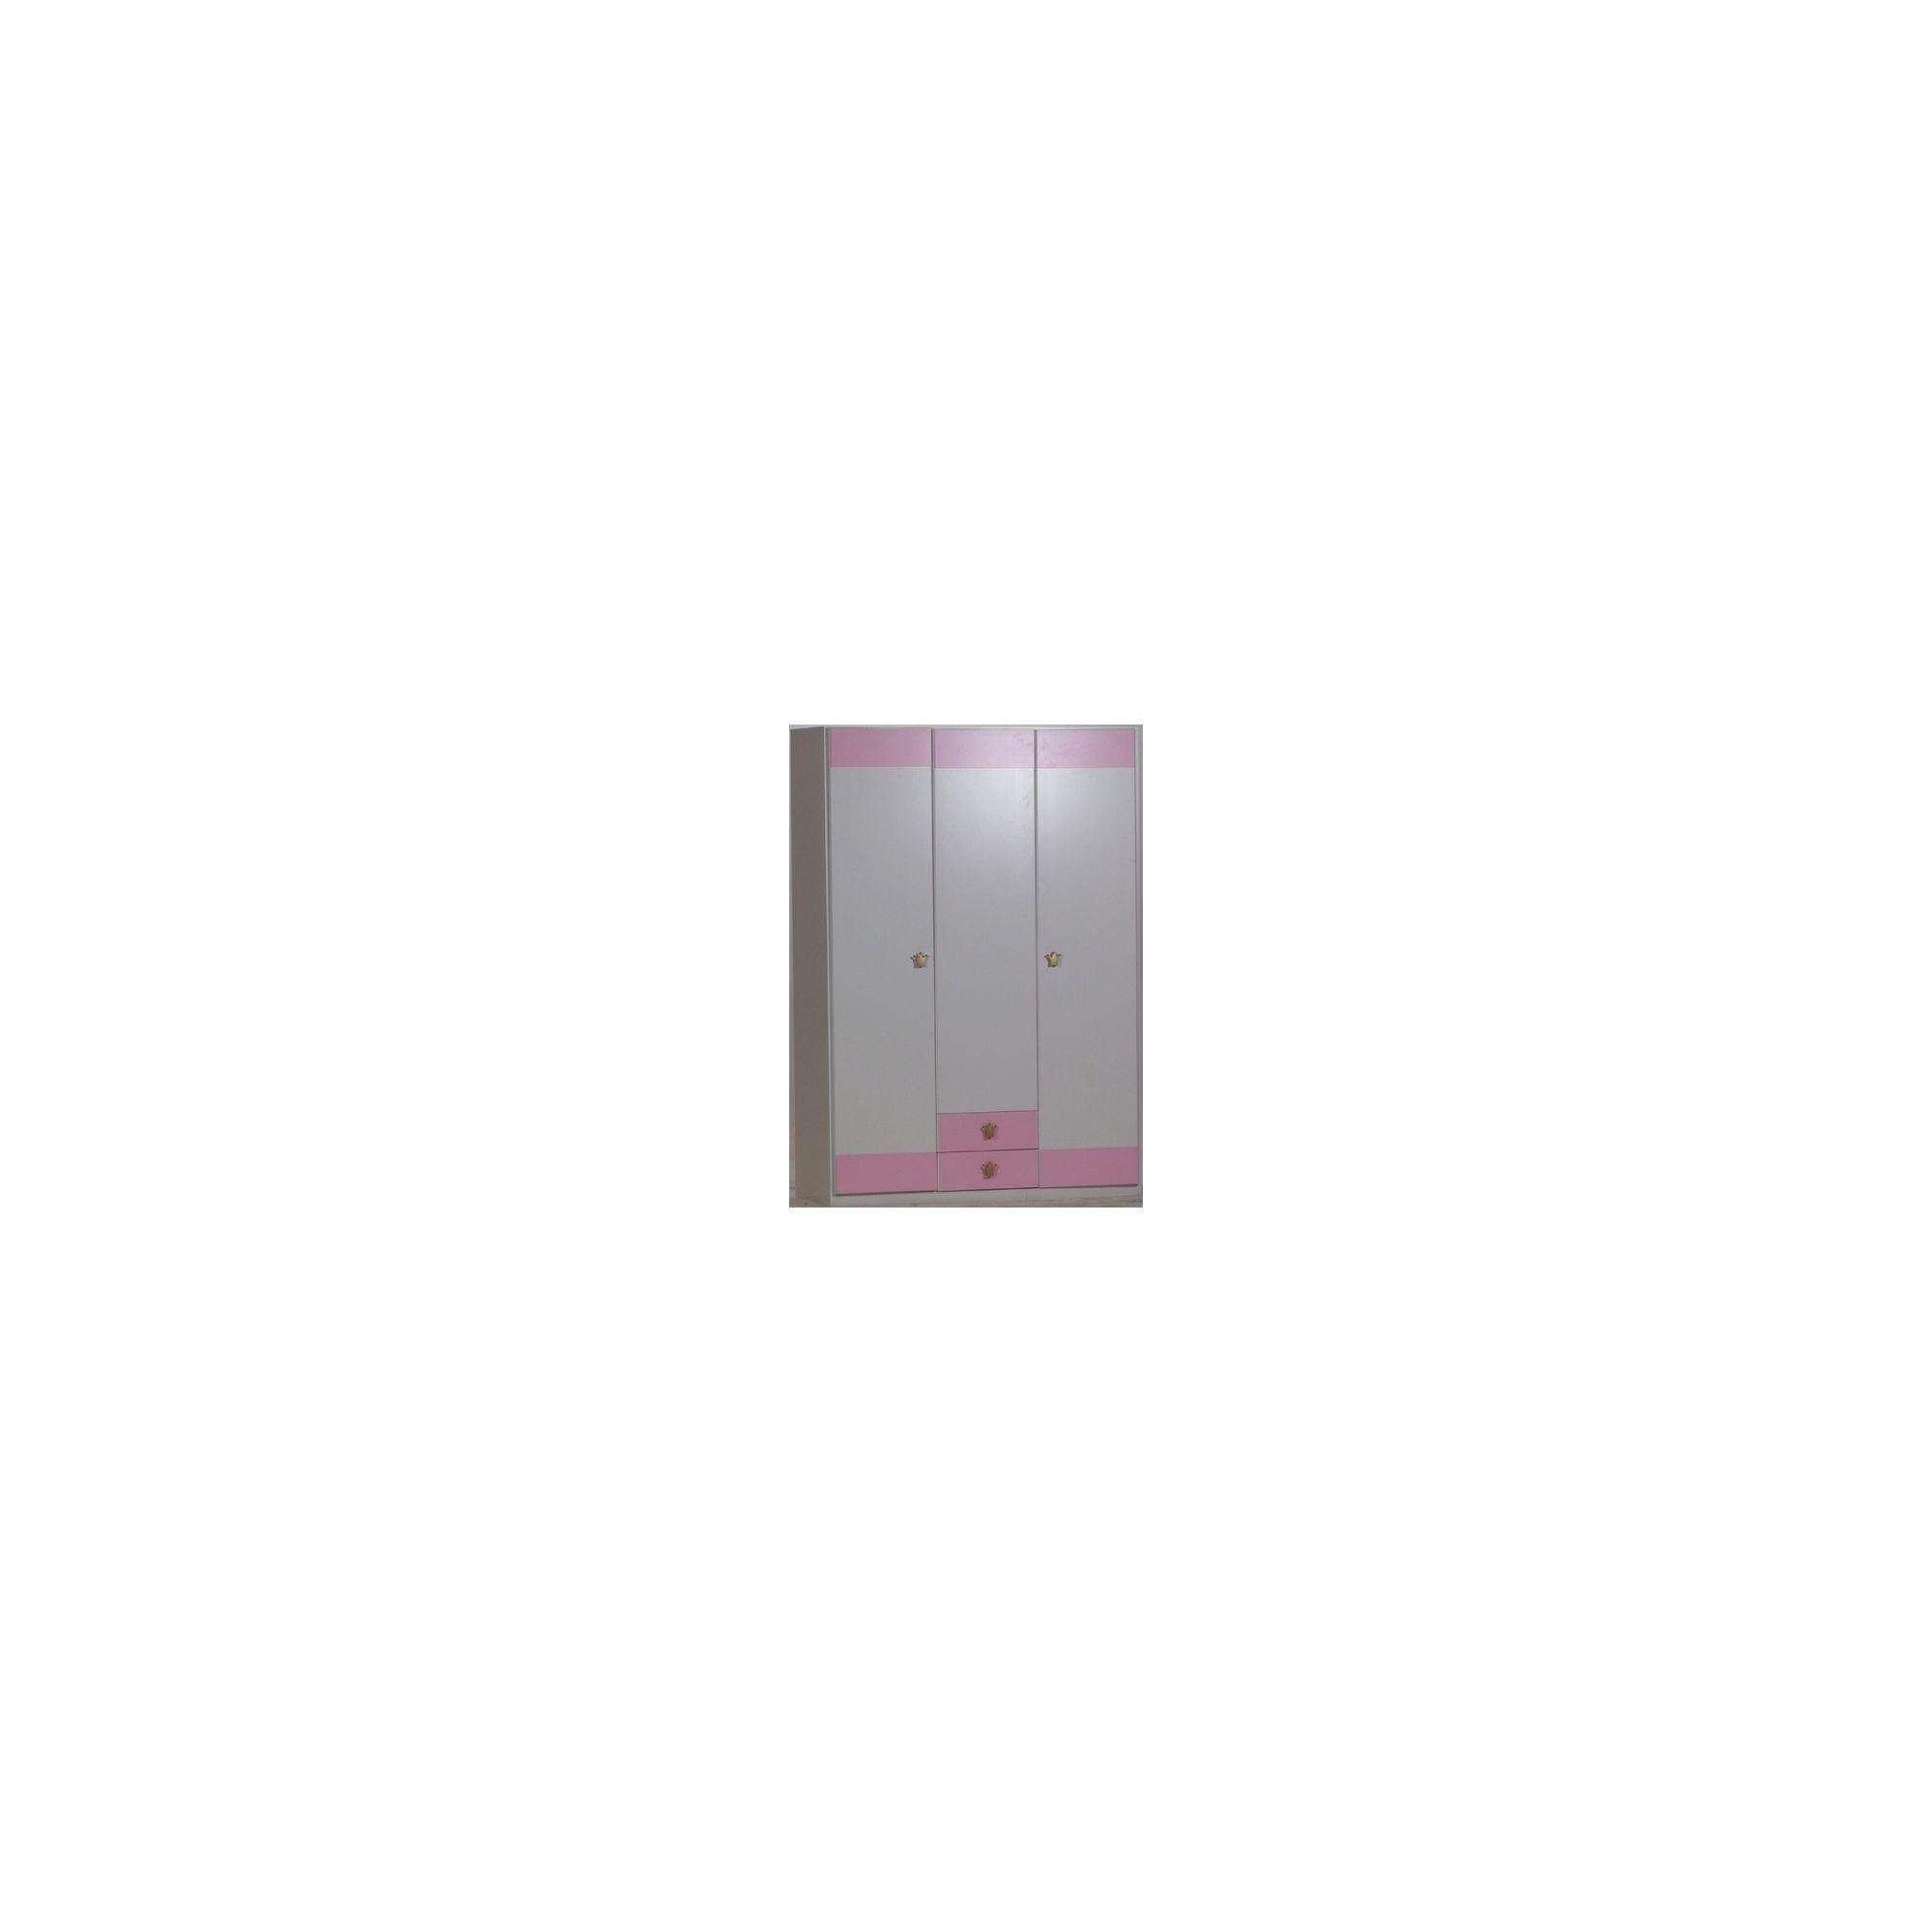 Ecos Furniture Princess 3 Door Wardrobe at Tesco Direct